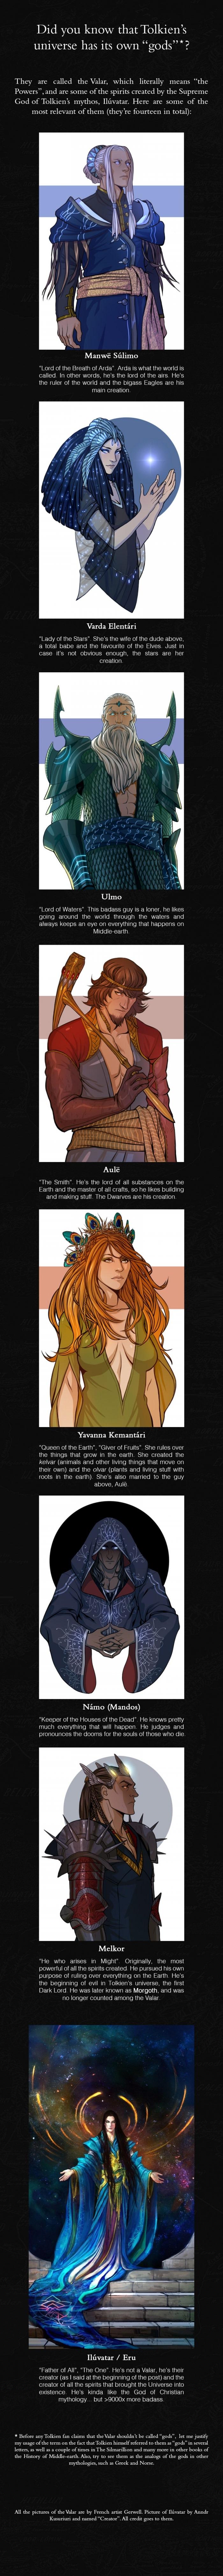 The Valar -  J.R.R. Tolkien's Mythology